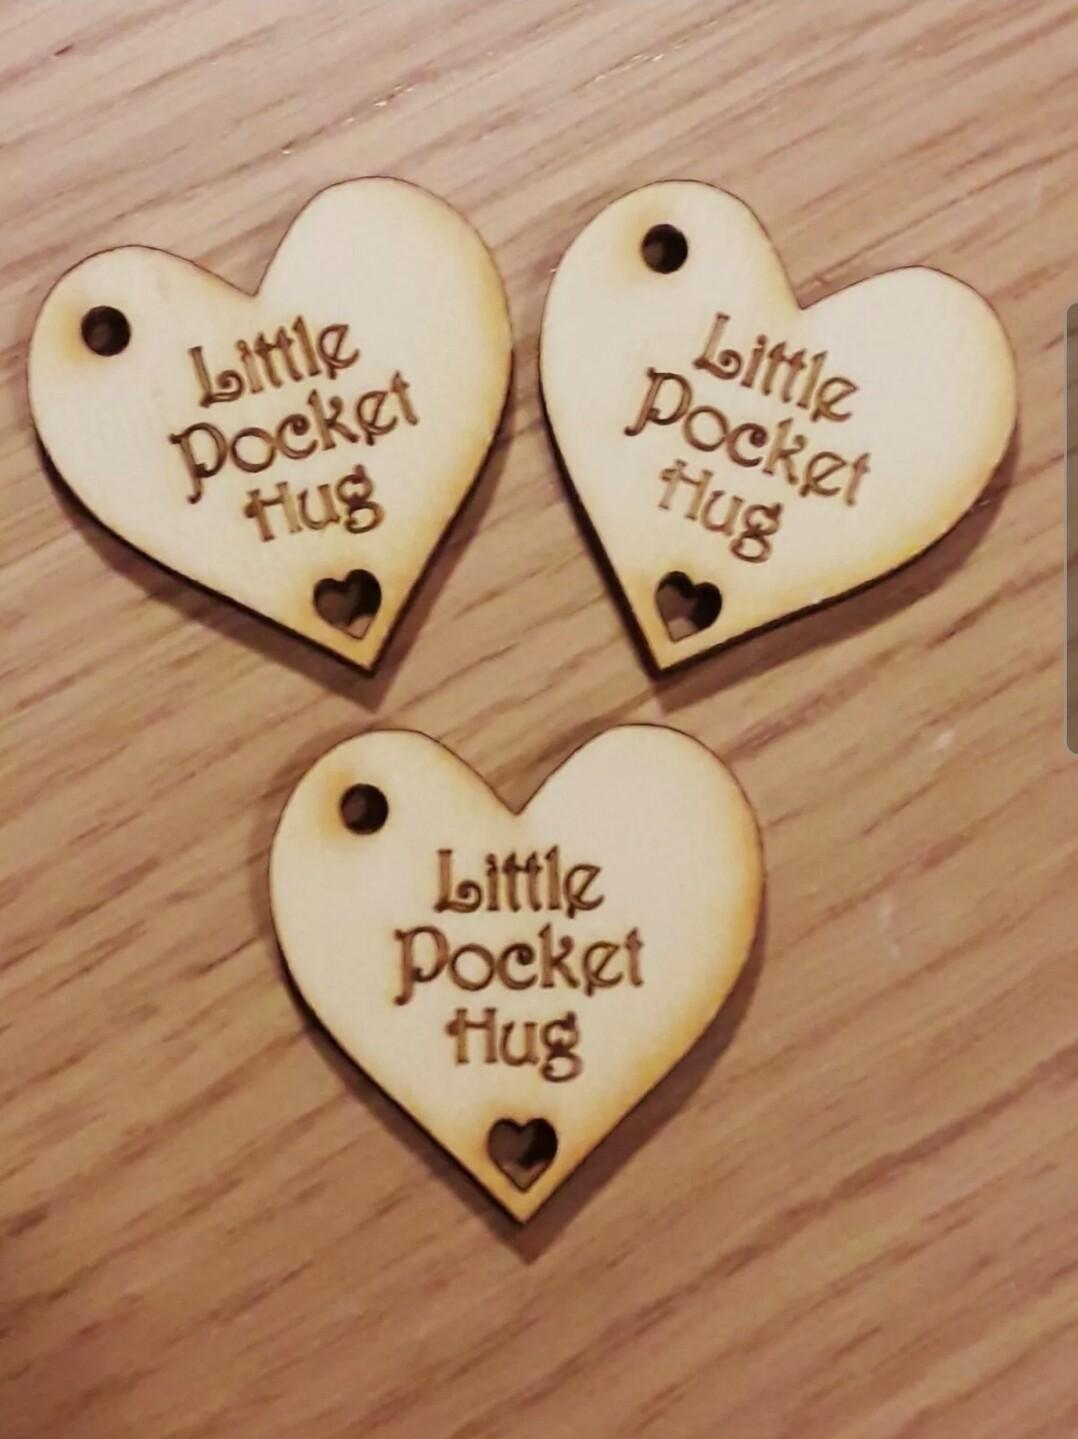 Little Pocket Hug with hole x 10